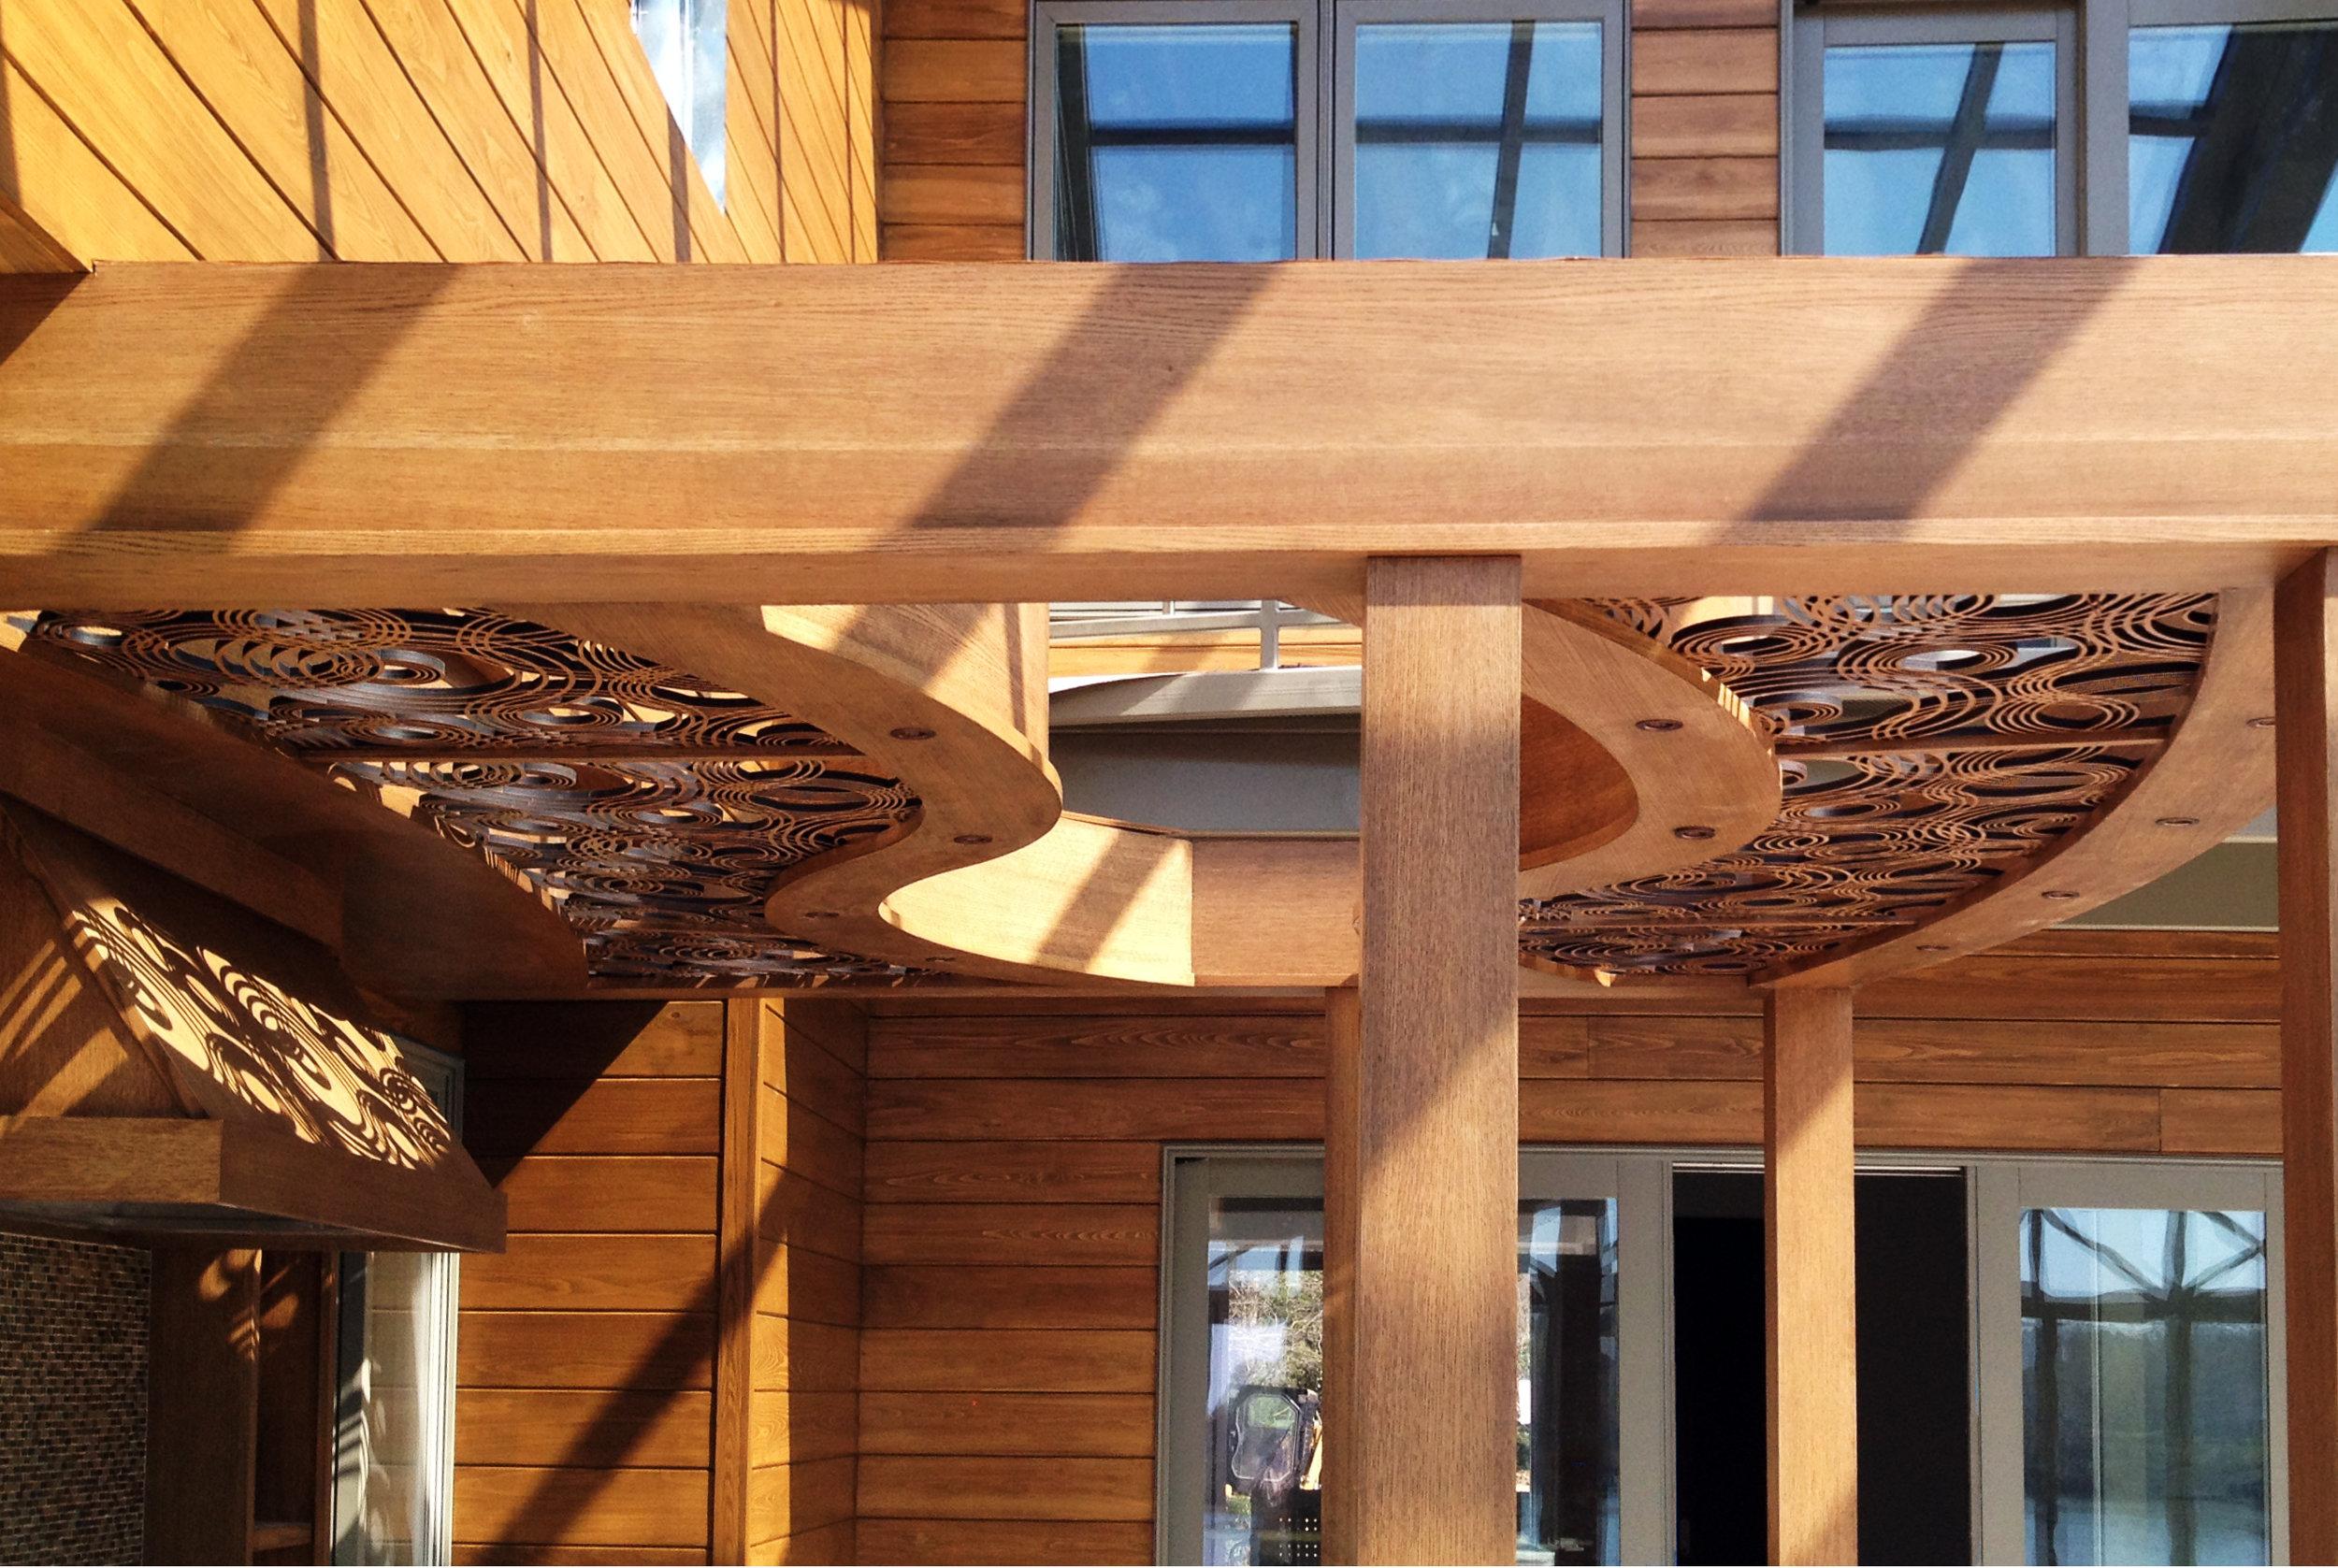 Private Residence, Irvington, VA  - Ruffino Cabinetry/Teri Wesselman, ASID - OMNI Design  Rain On Water pattern, decorative outdoor panels